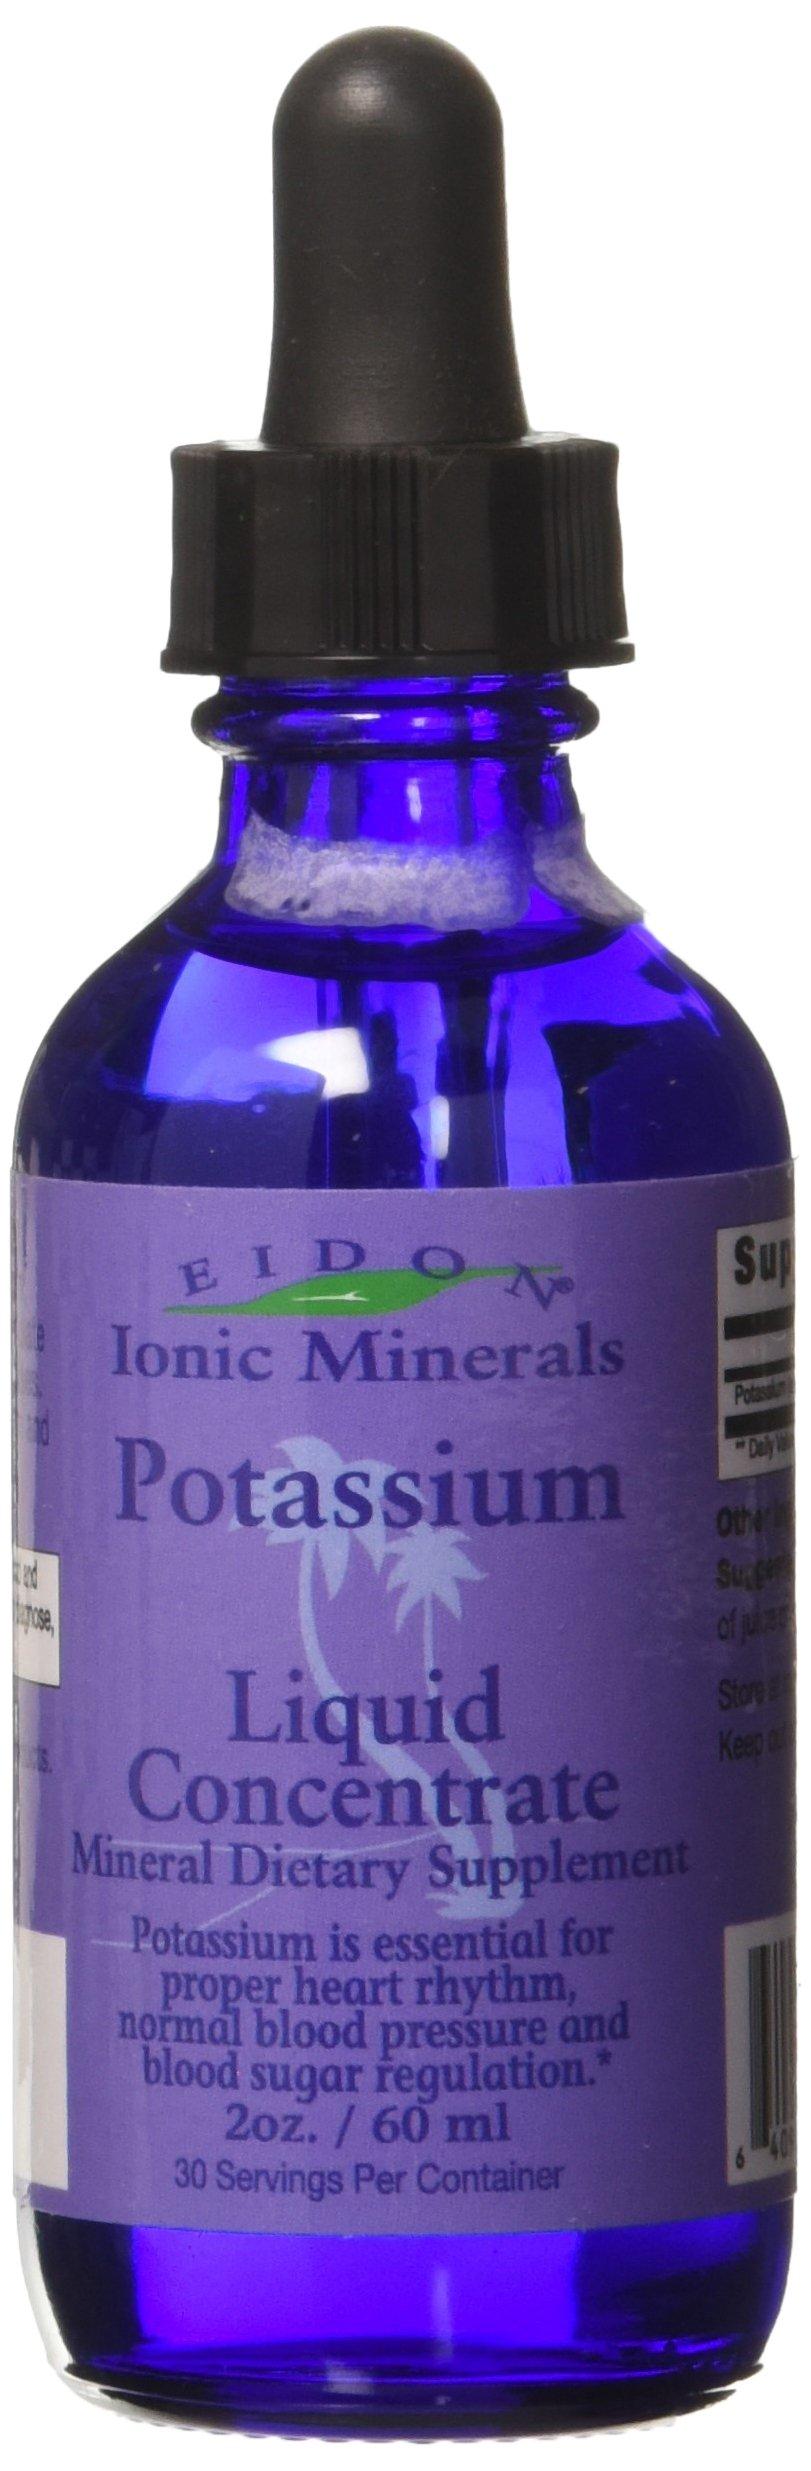 Eidon Potassium Mineral Supplement, 2 Ounce by EIDON